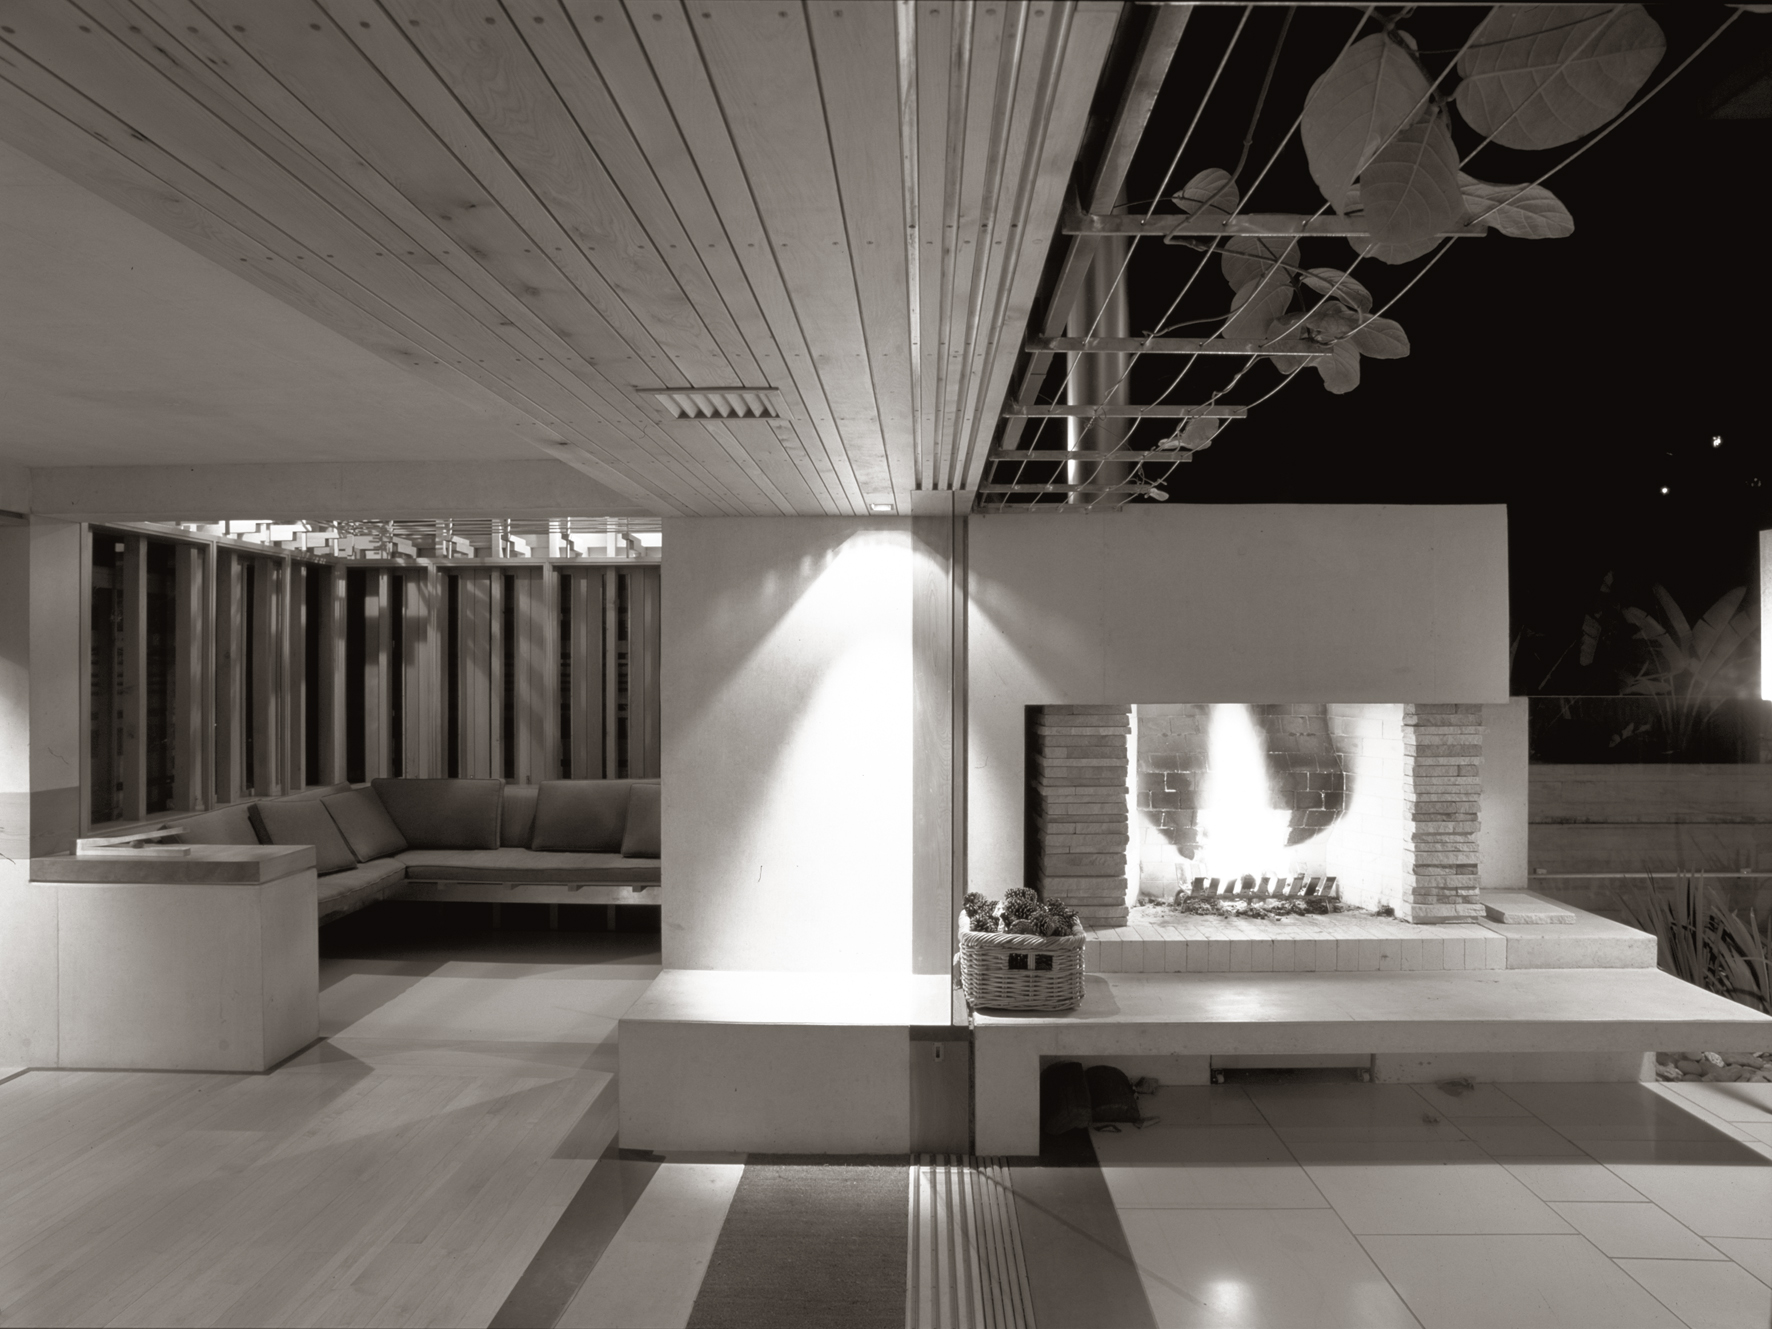 C House_TLinkins_Tea Room + Fireplace B&W.jpg